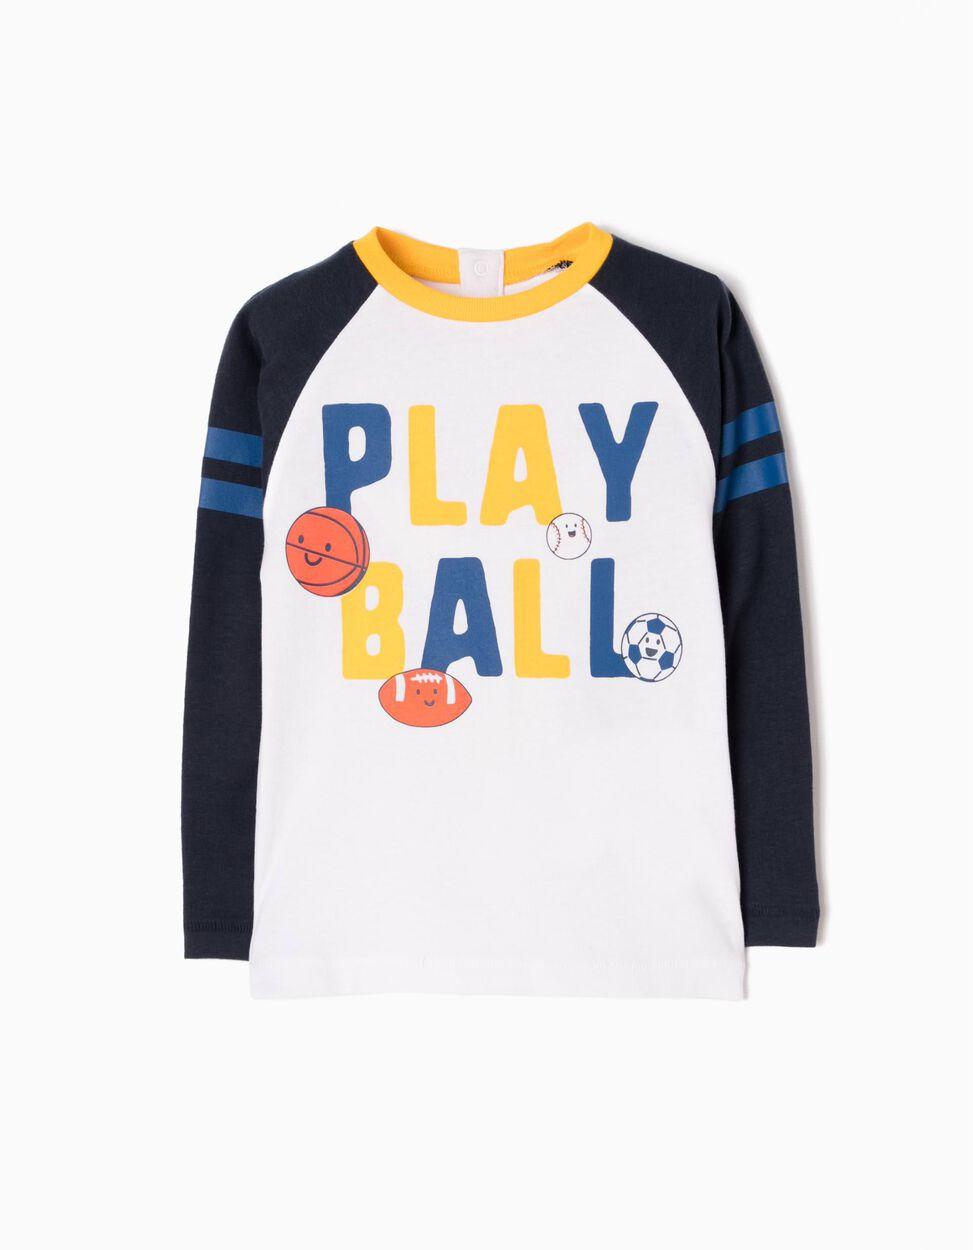 Camiseta de Manga larga Estampada Playball